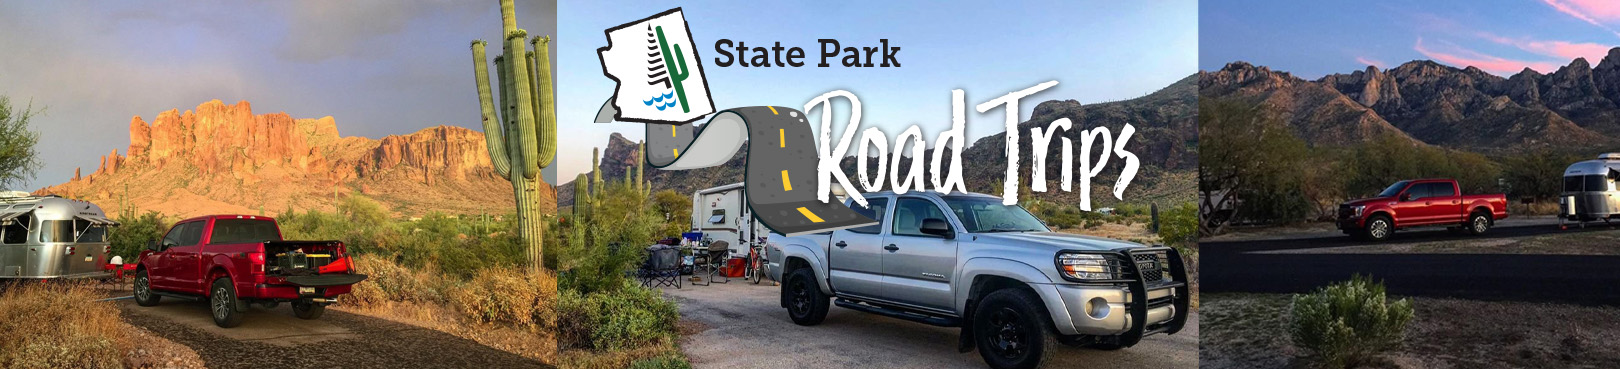 park-banner